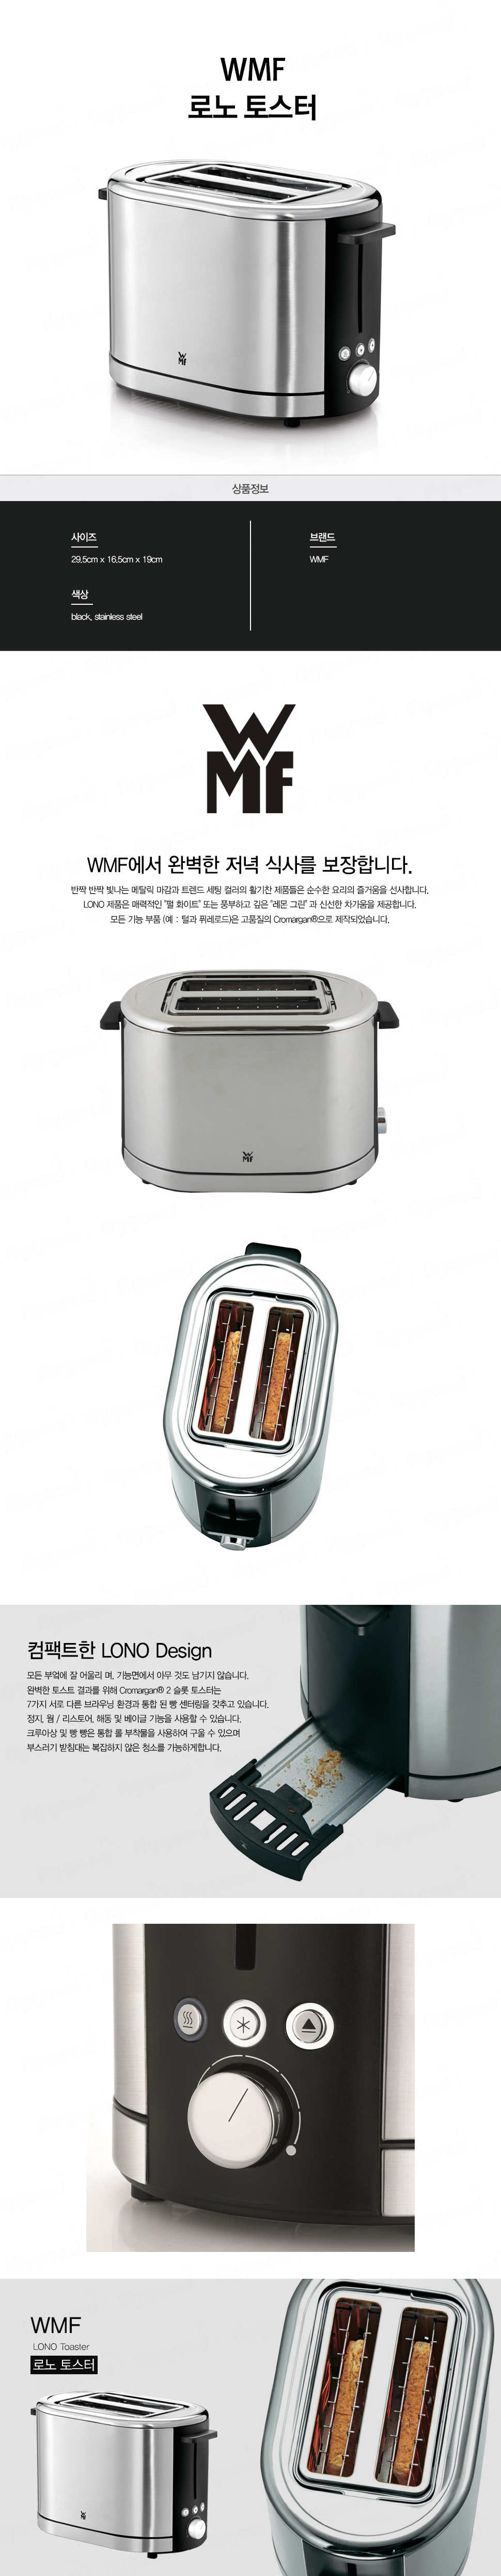 WMF_LONO_Toaster.jpg